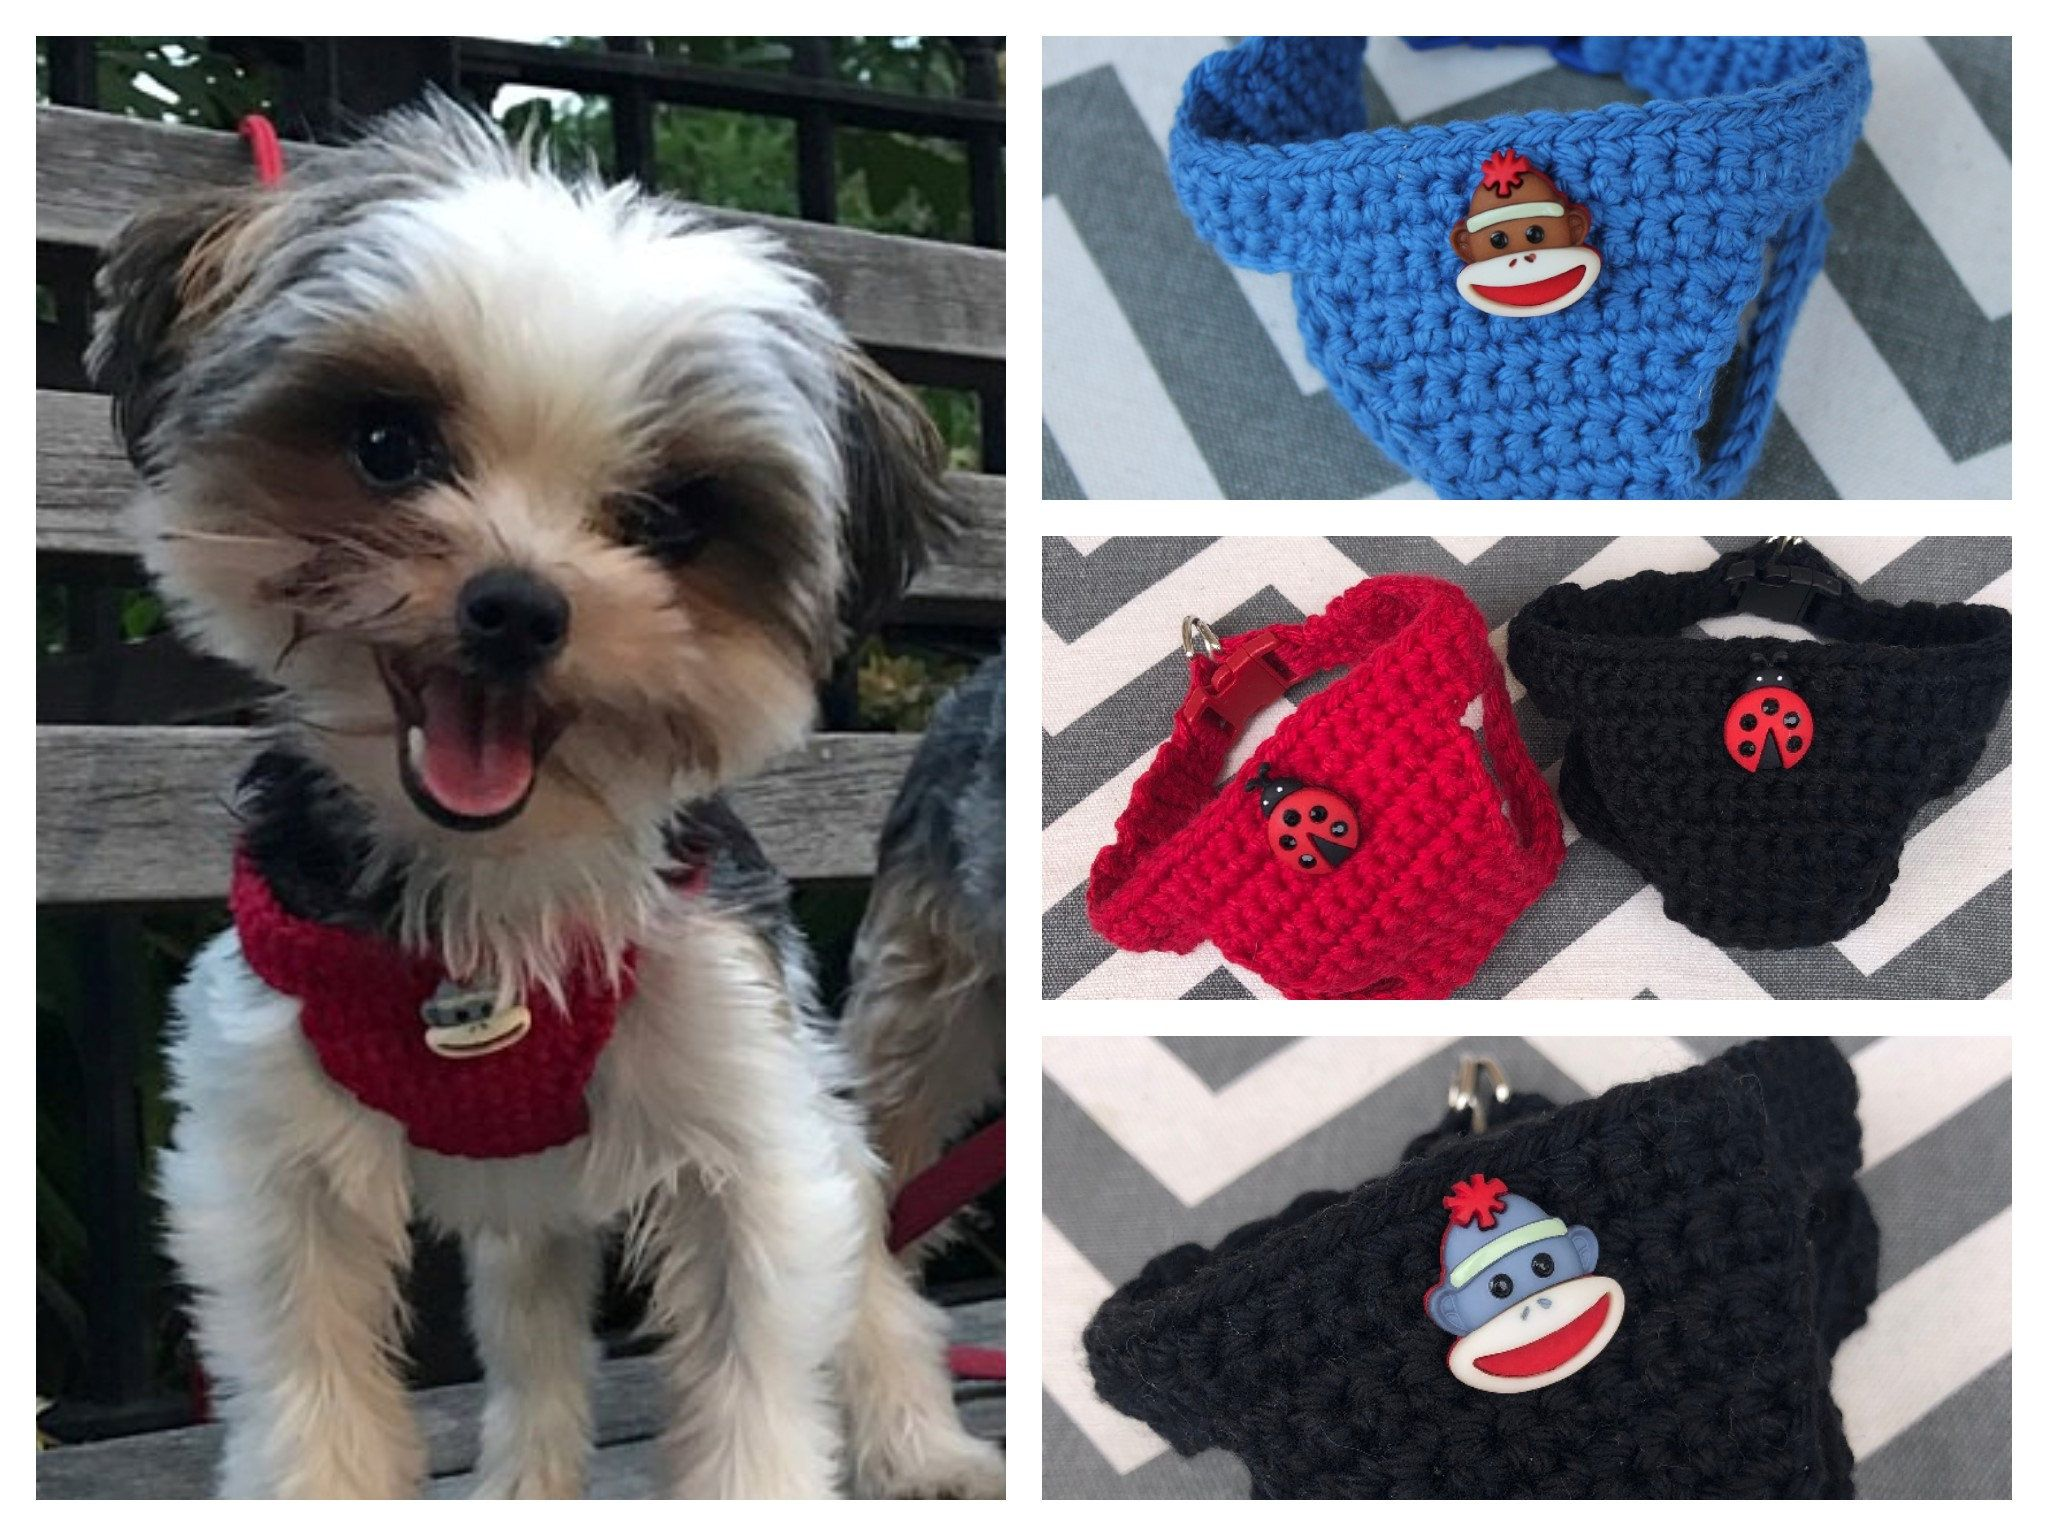 Tiny Dog Puppy Harness 2 Lbs Xxxs Xxs Soft Cotton W Button Chihuahua Yorkie Maltese Shih Tzu Pomeranian Maltipoo Teacup Kitten Puppy In 2020 Puppy Harness Teacup